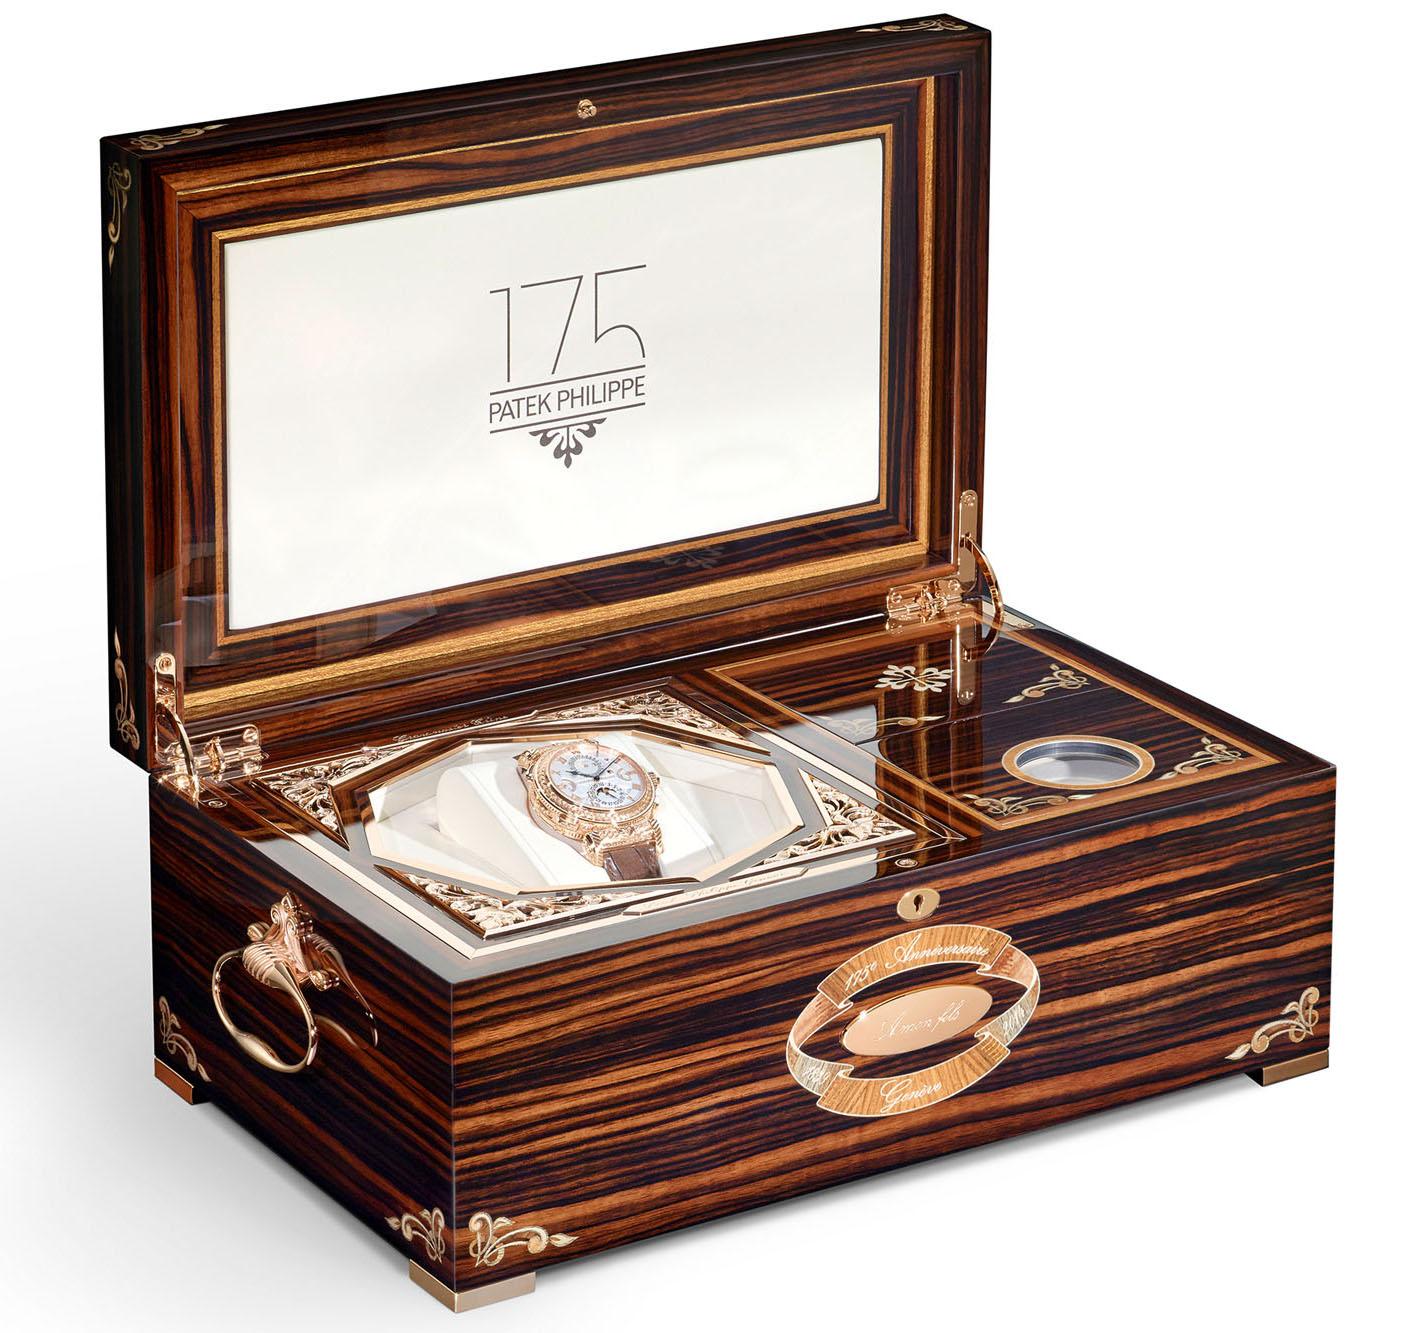 Patek Philippe Grandmaster Chime  presentation box